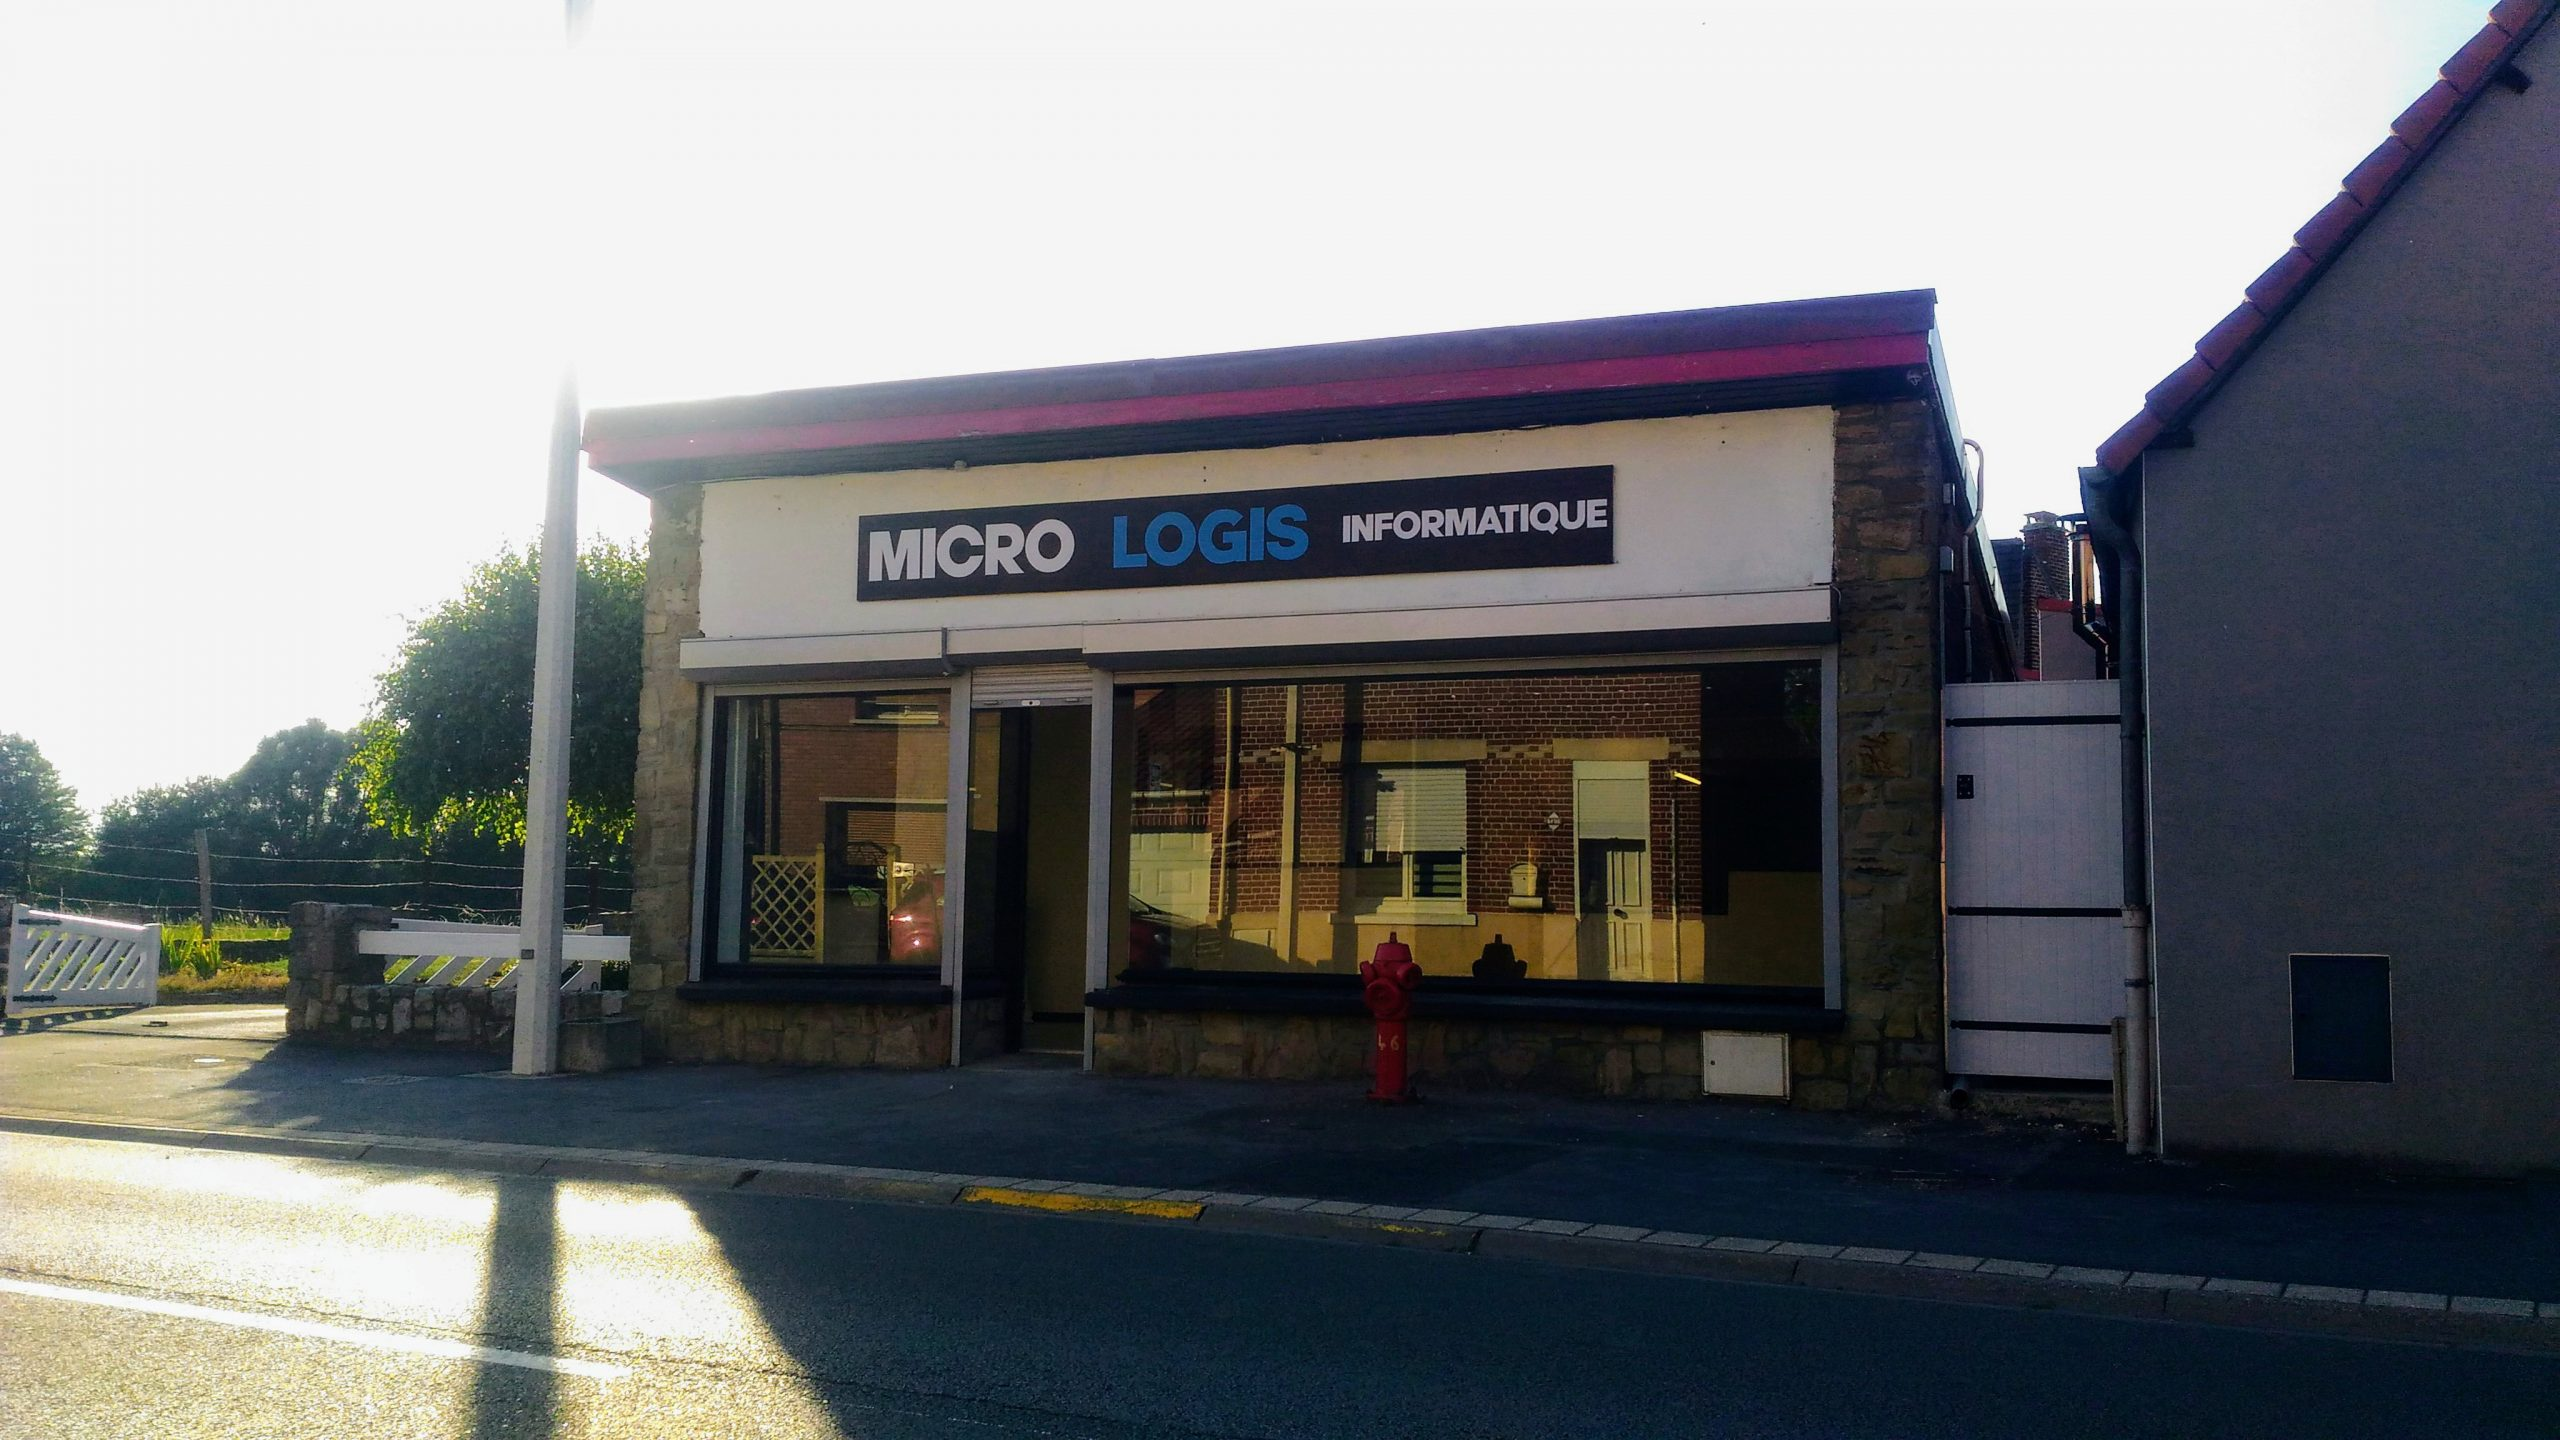 MICRO LOGIS INFORMATIQUE